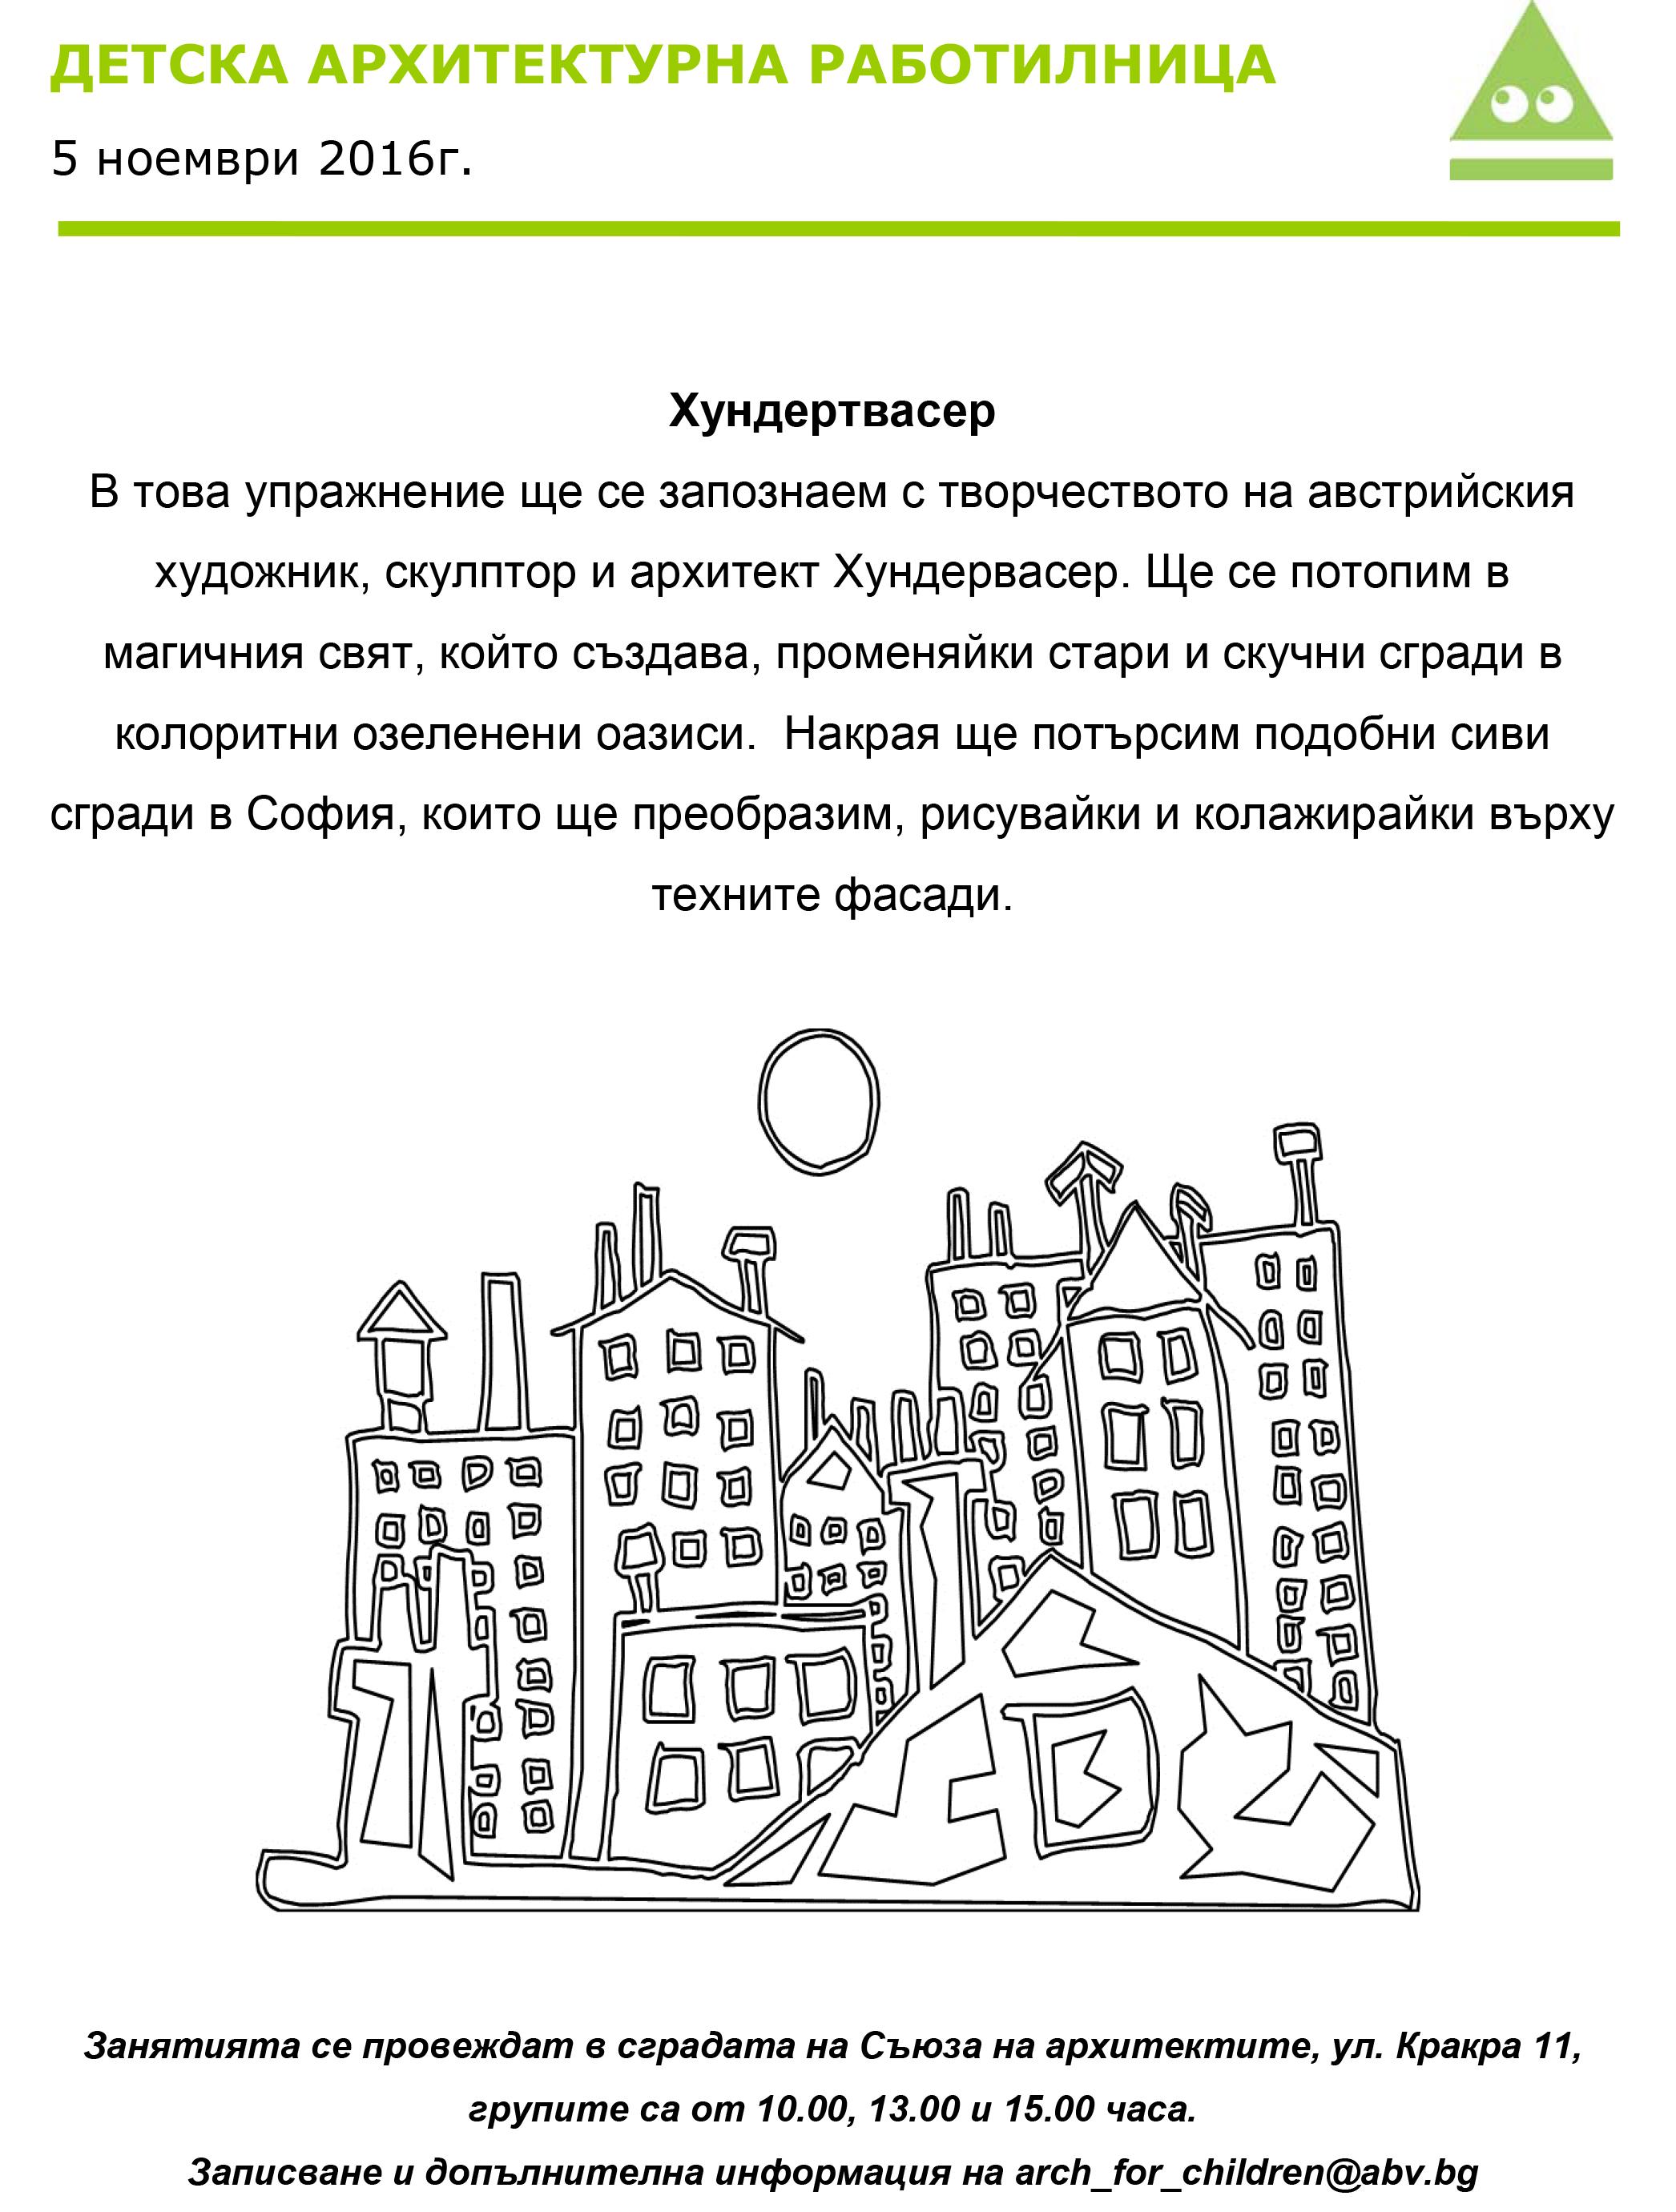 5 ноември 2016г - Хундертвасер